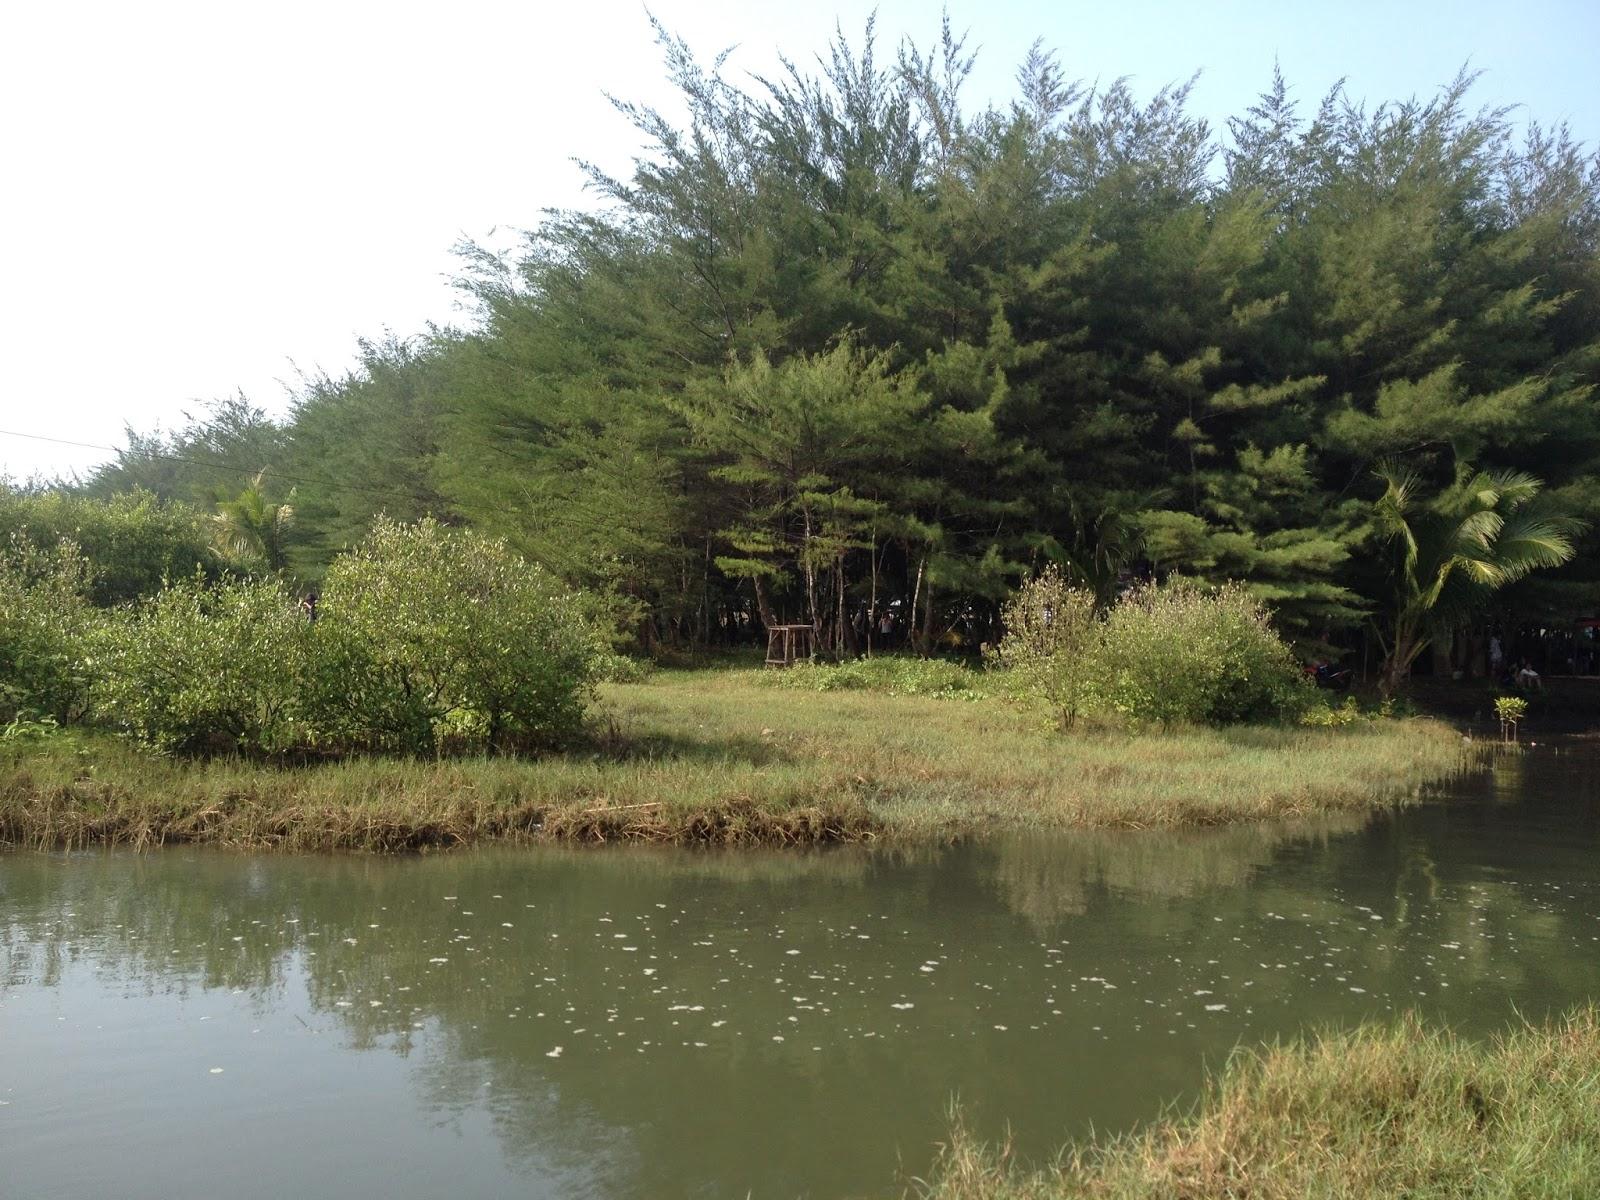 Cerita Seputar Kebumen Pantai Lembupurwo Sensasi Laguna Gumuk Cemara Udang